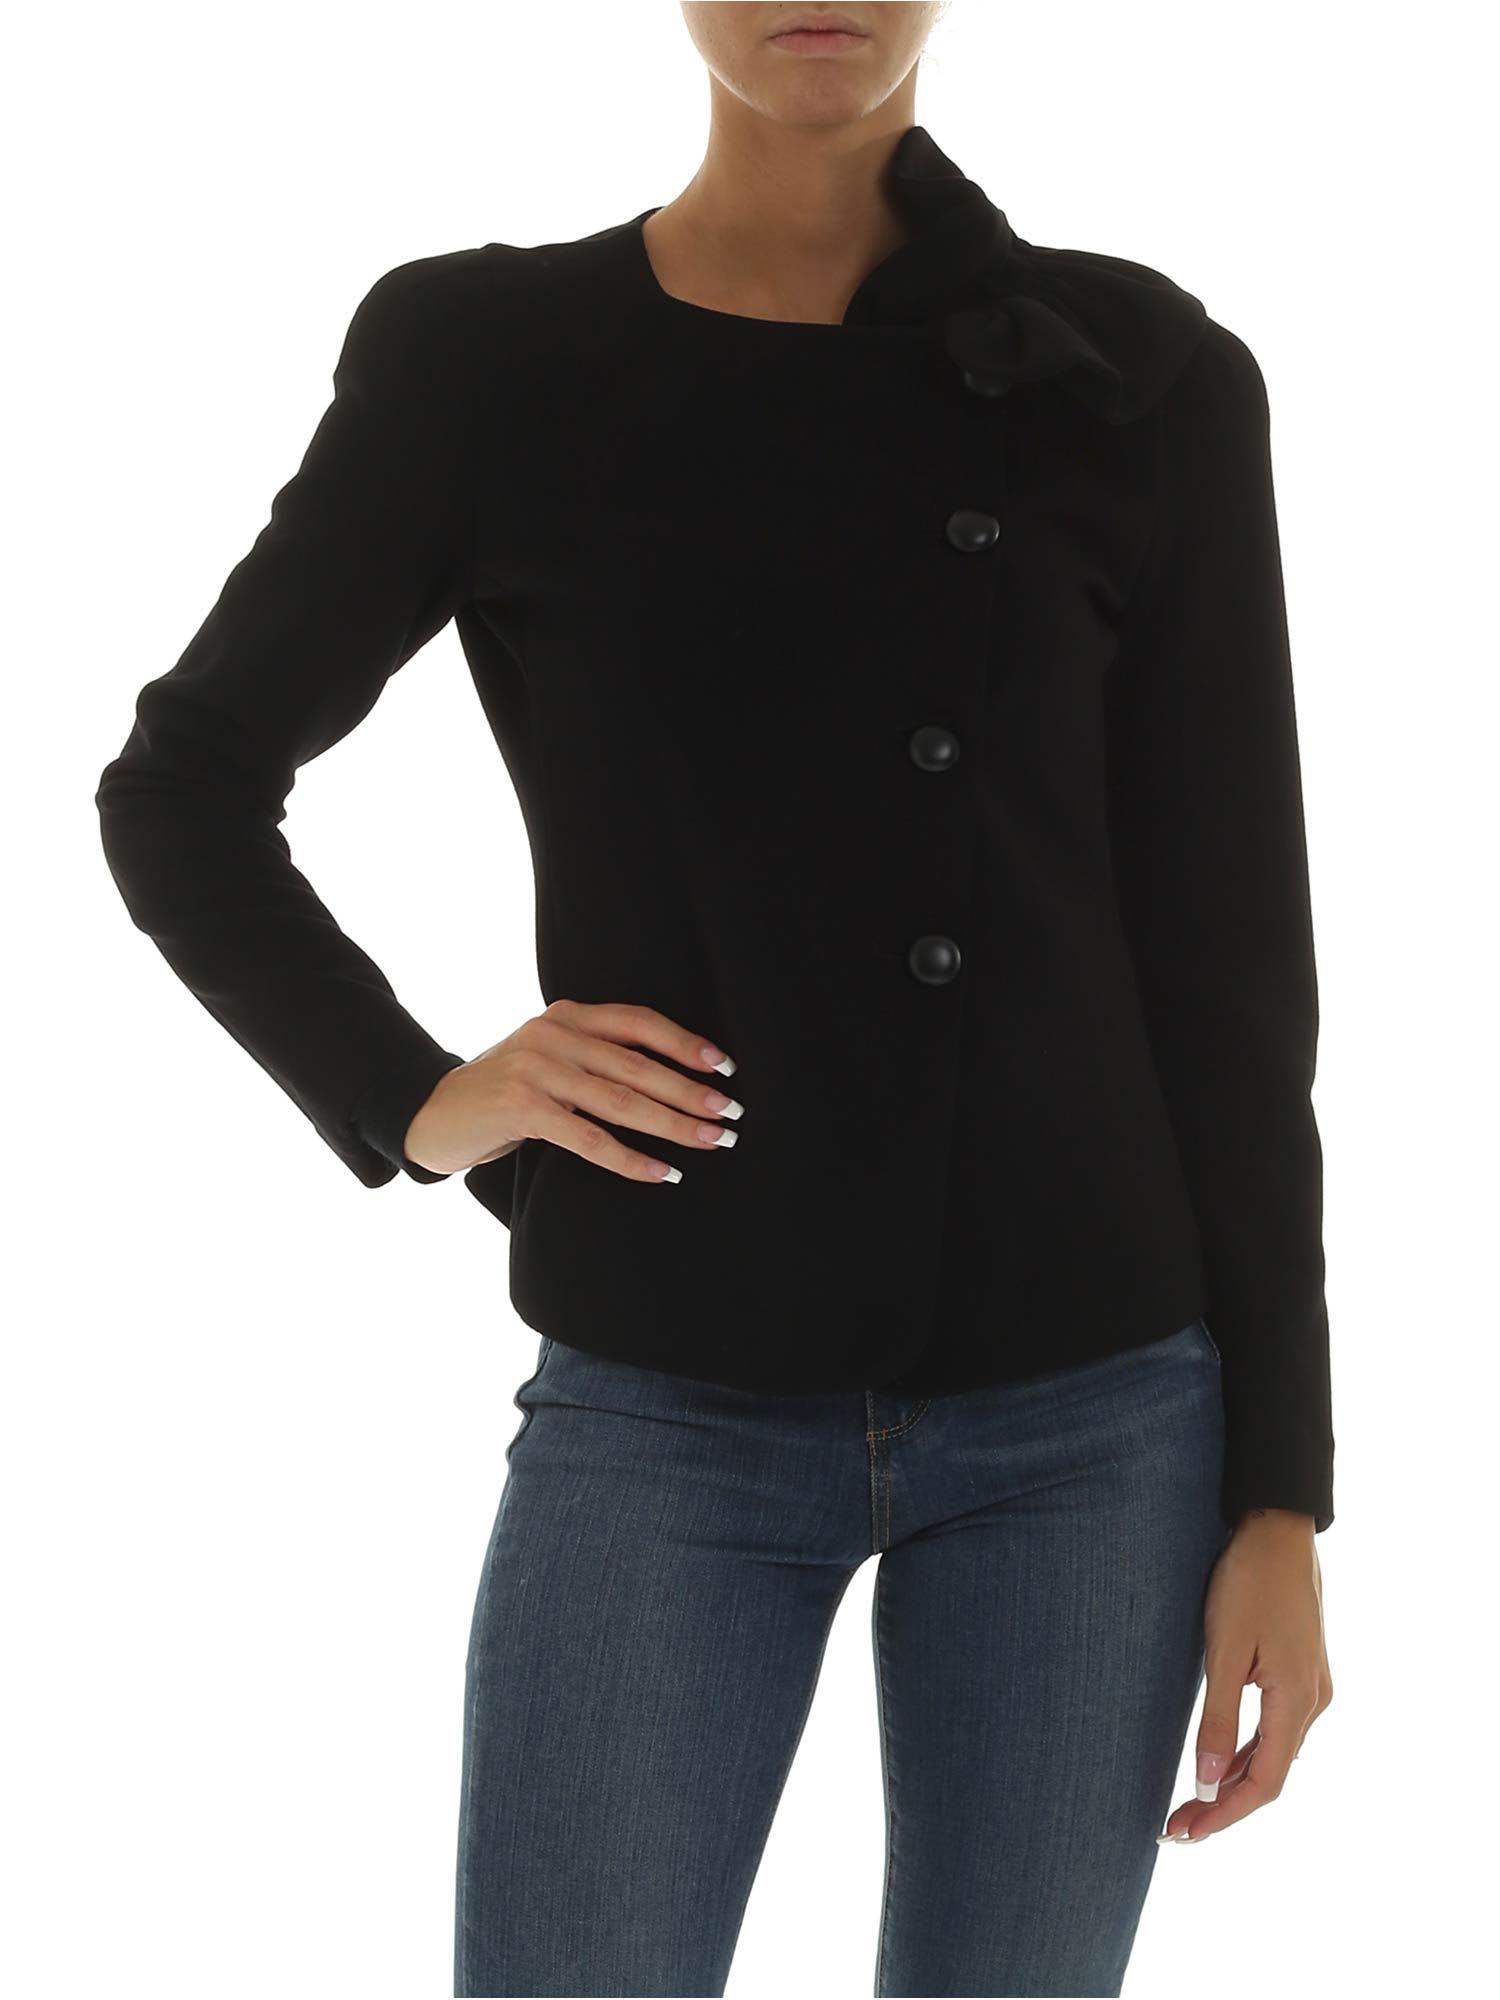 Emporio Armani Black Jacket With Bow Detail